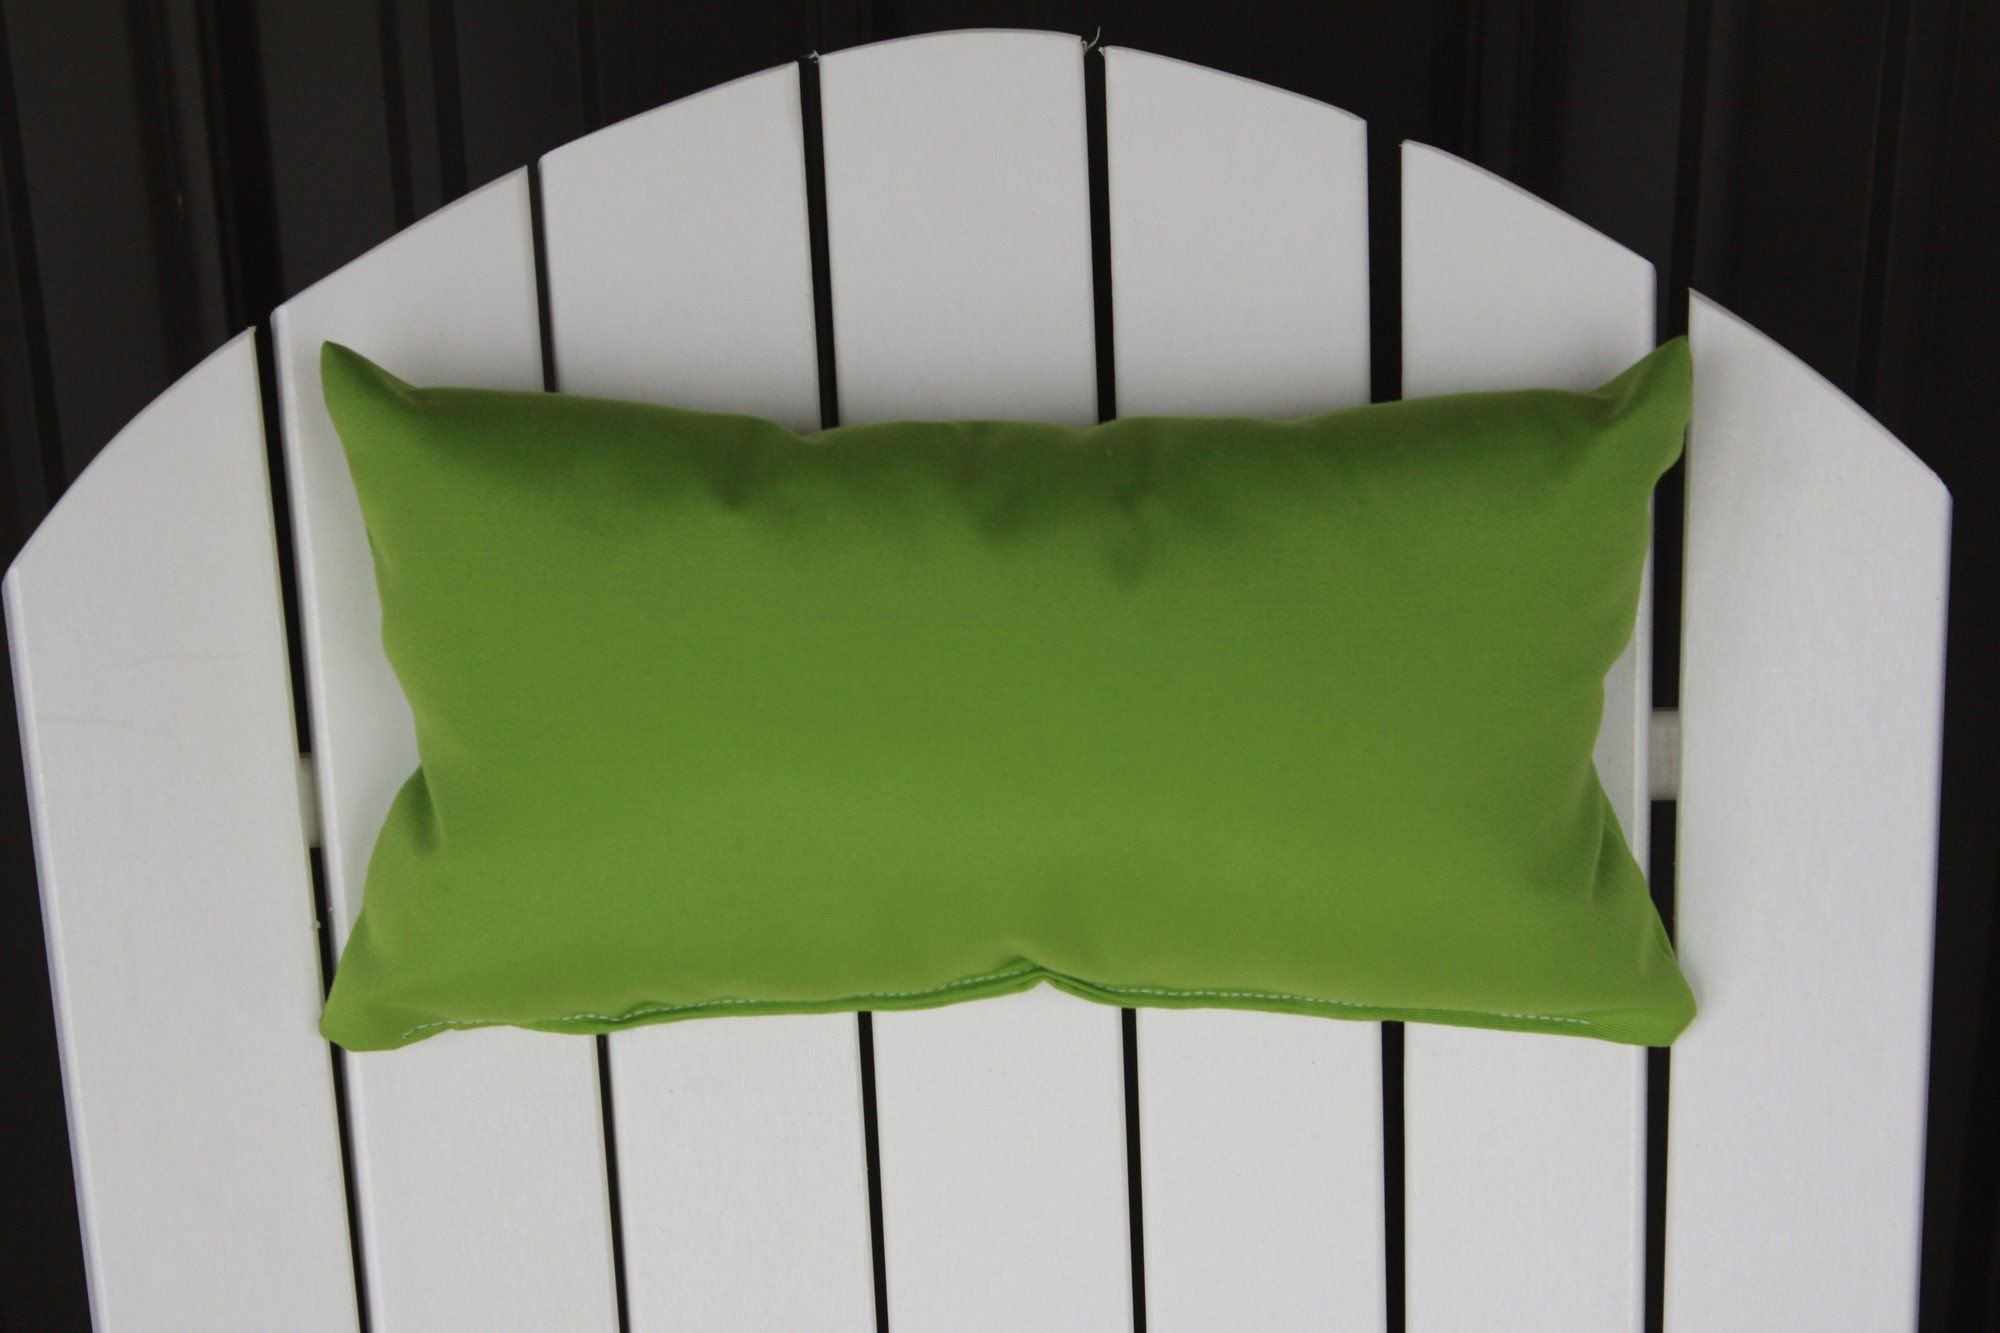 Adirondack Chair Outdoor Head Pillow Outdoor Chairs Head Pillow Adirondack Chair